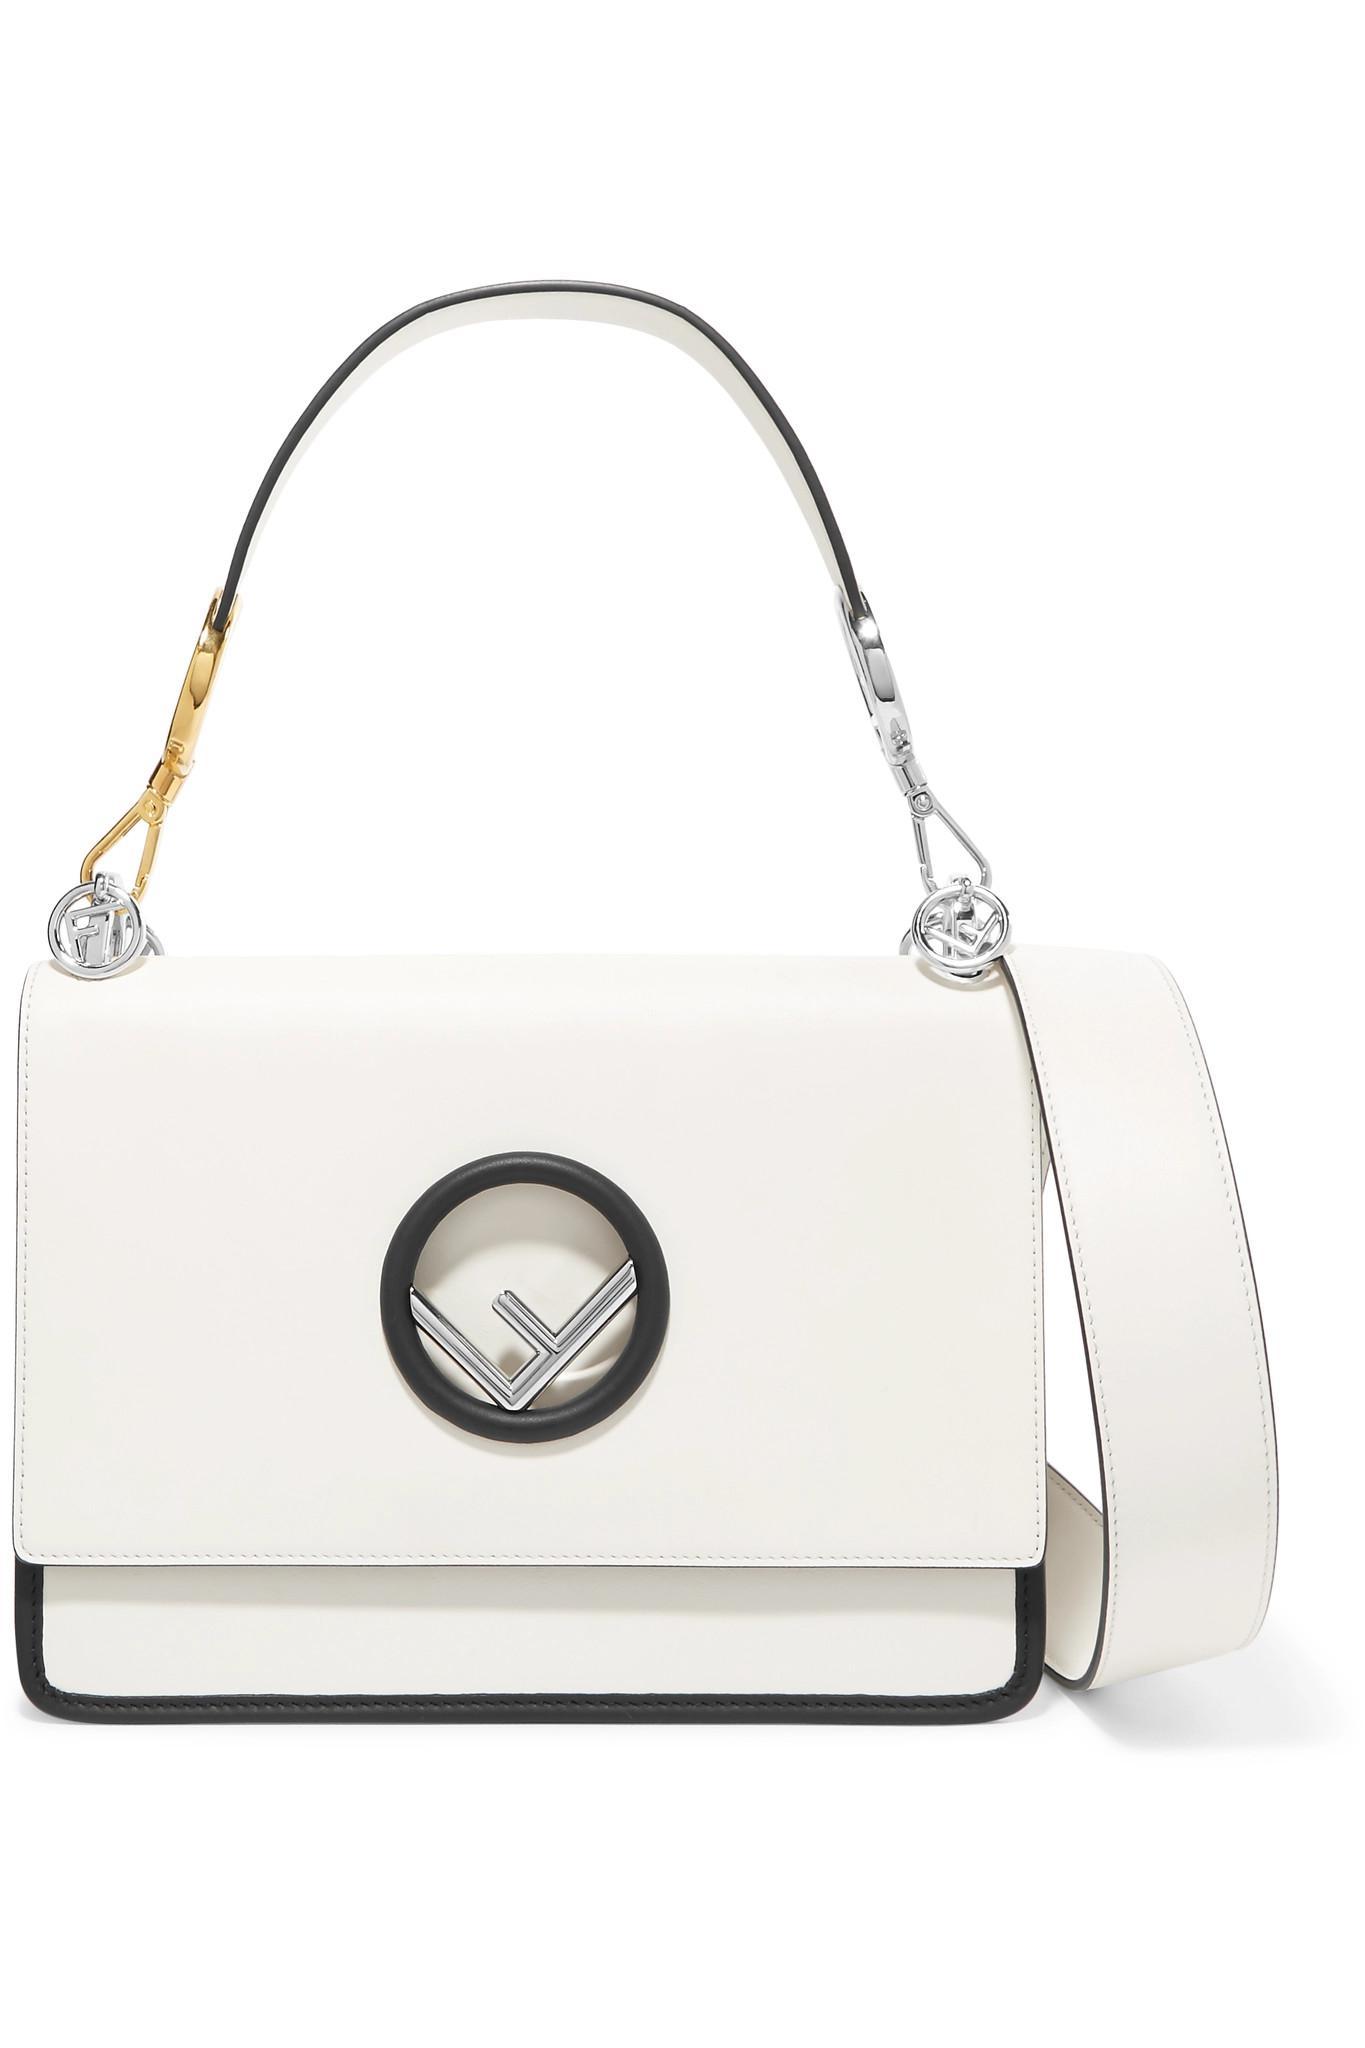 Fendi Kan I Leather Shoulder Bag in White - Lyst ce5b64ec0ca6a